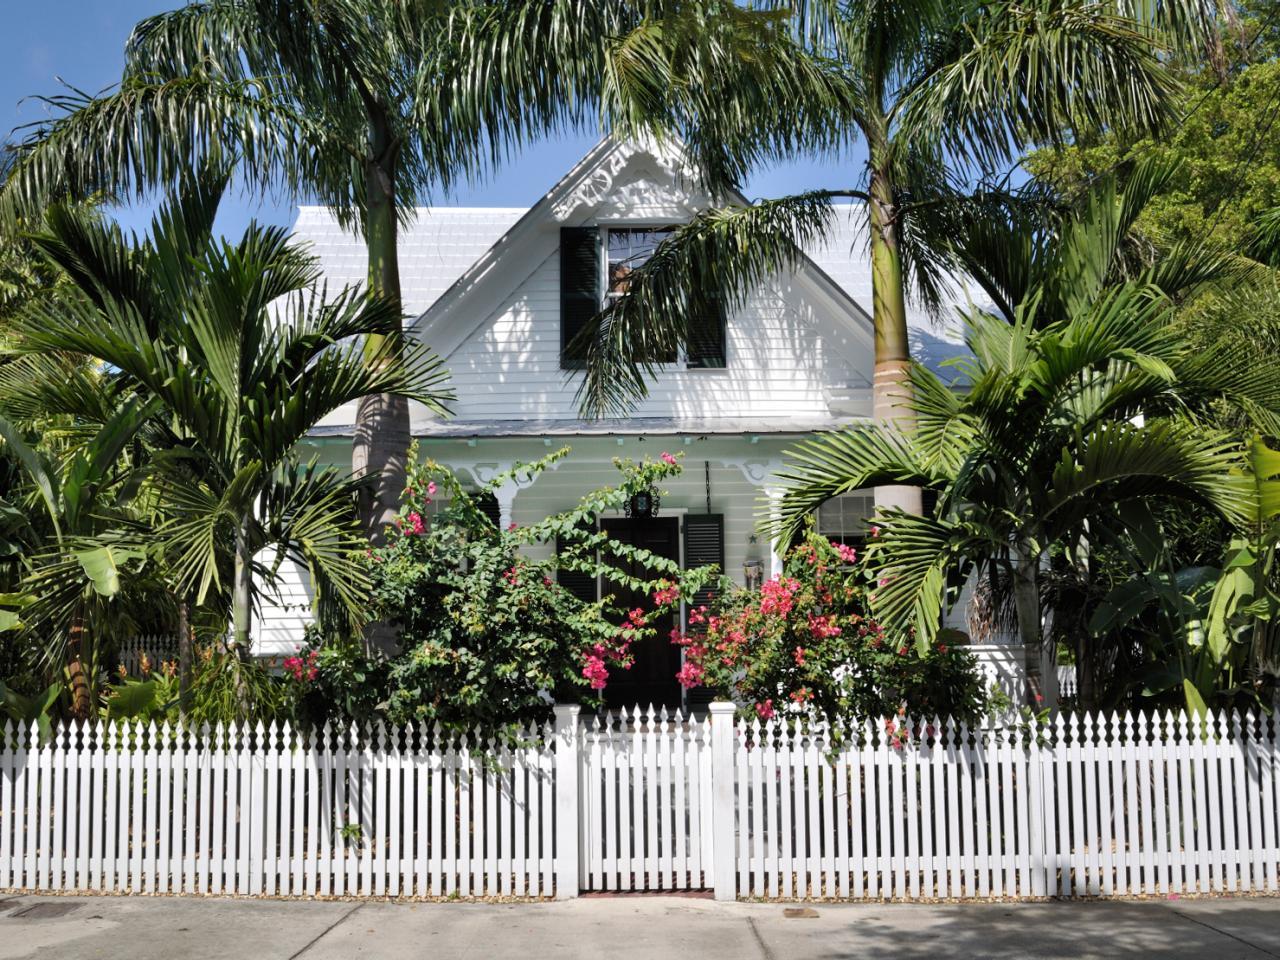 istock-14055330_key-west-cottage-white-fence_s4x3.jpg.rend.hgtvcom.1280.960.jpeg